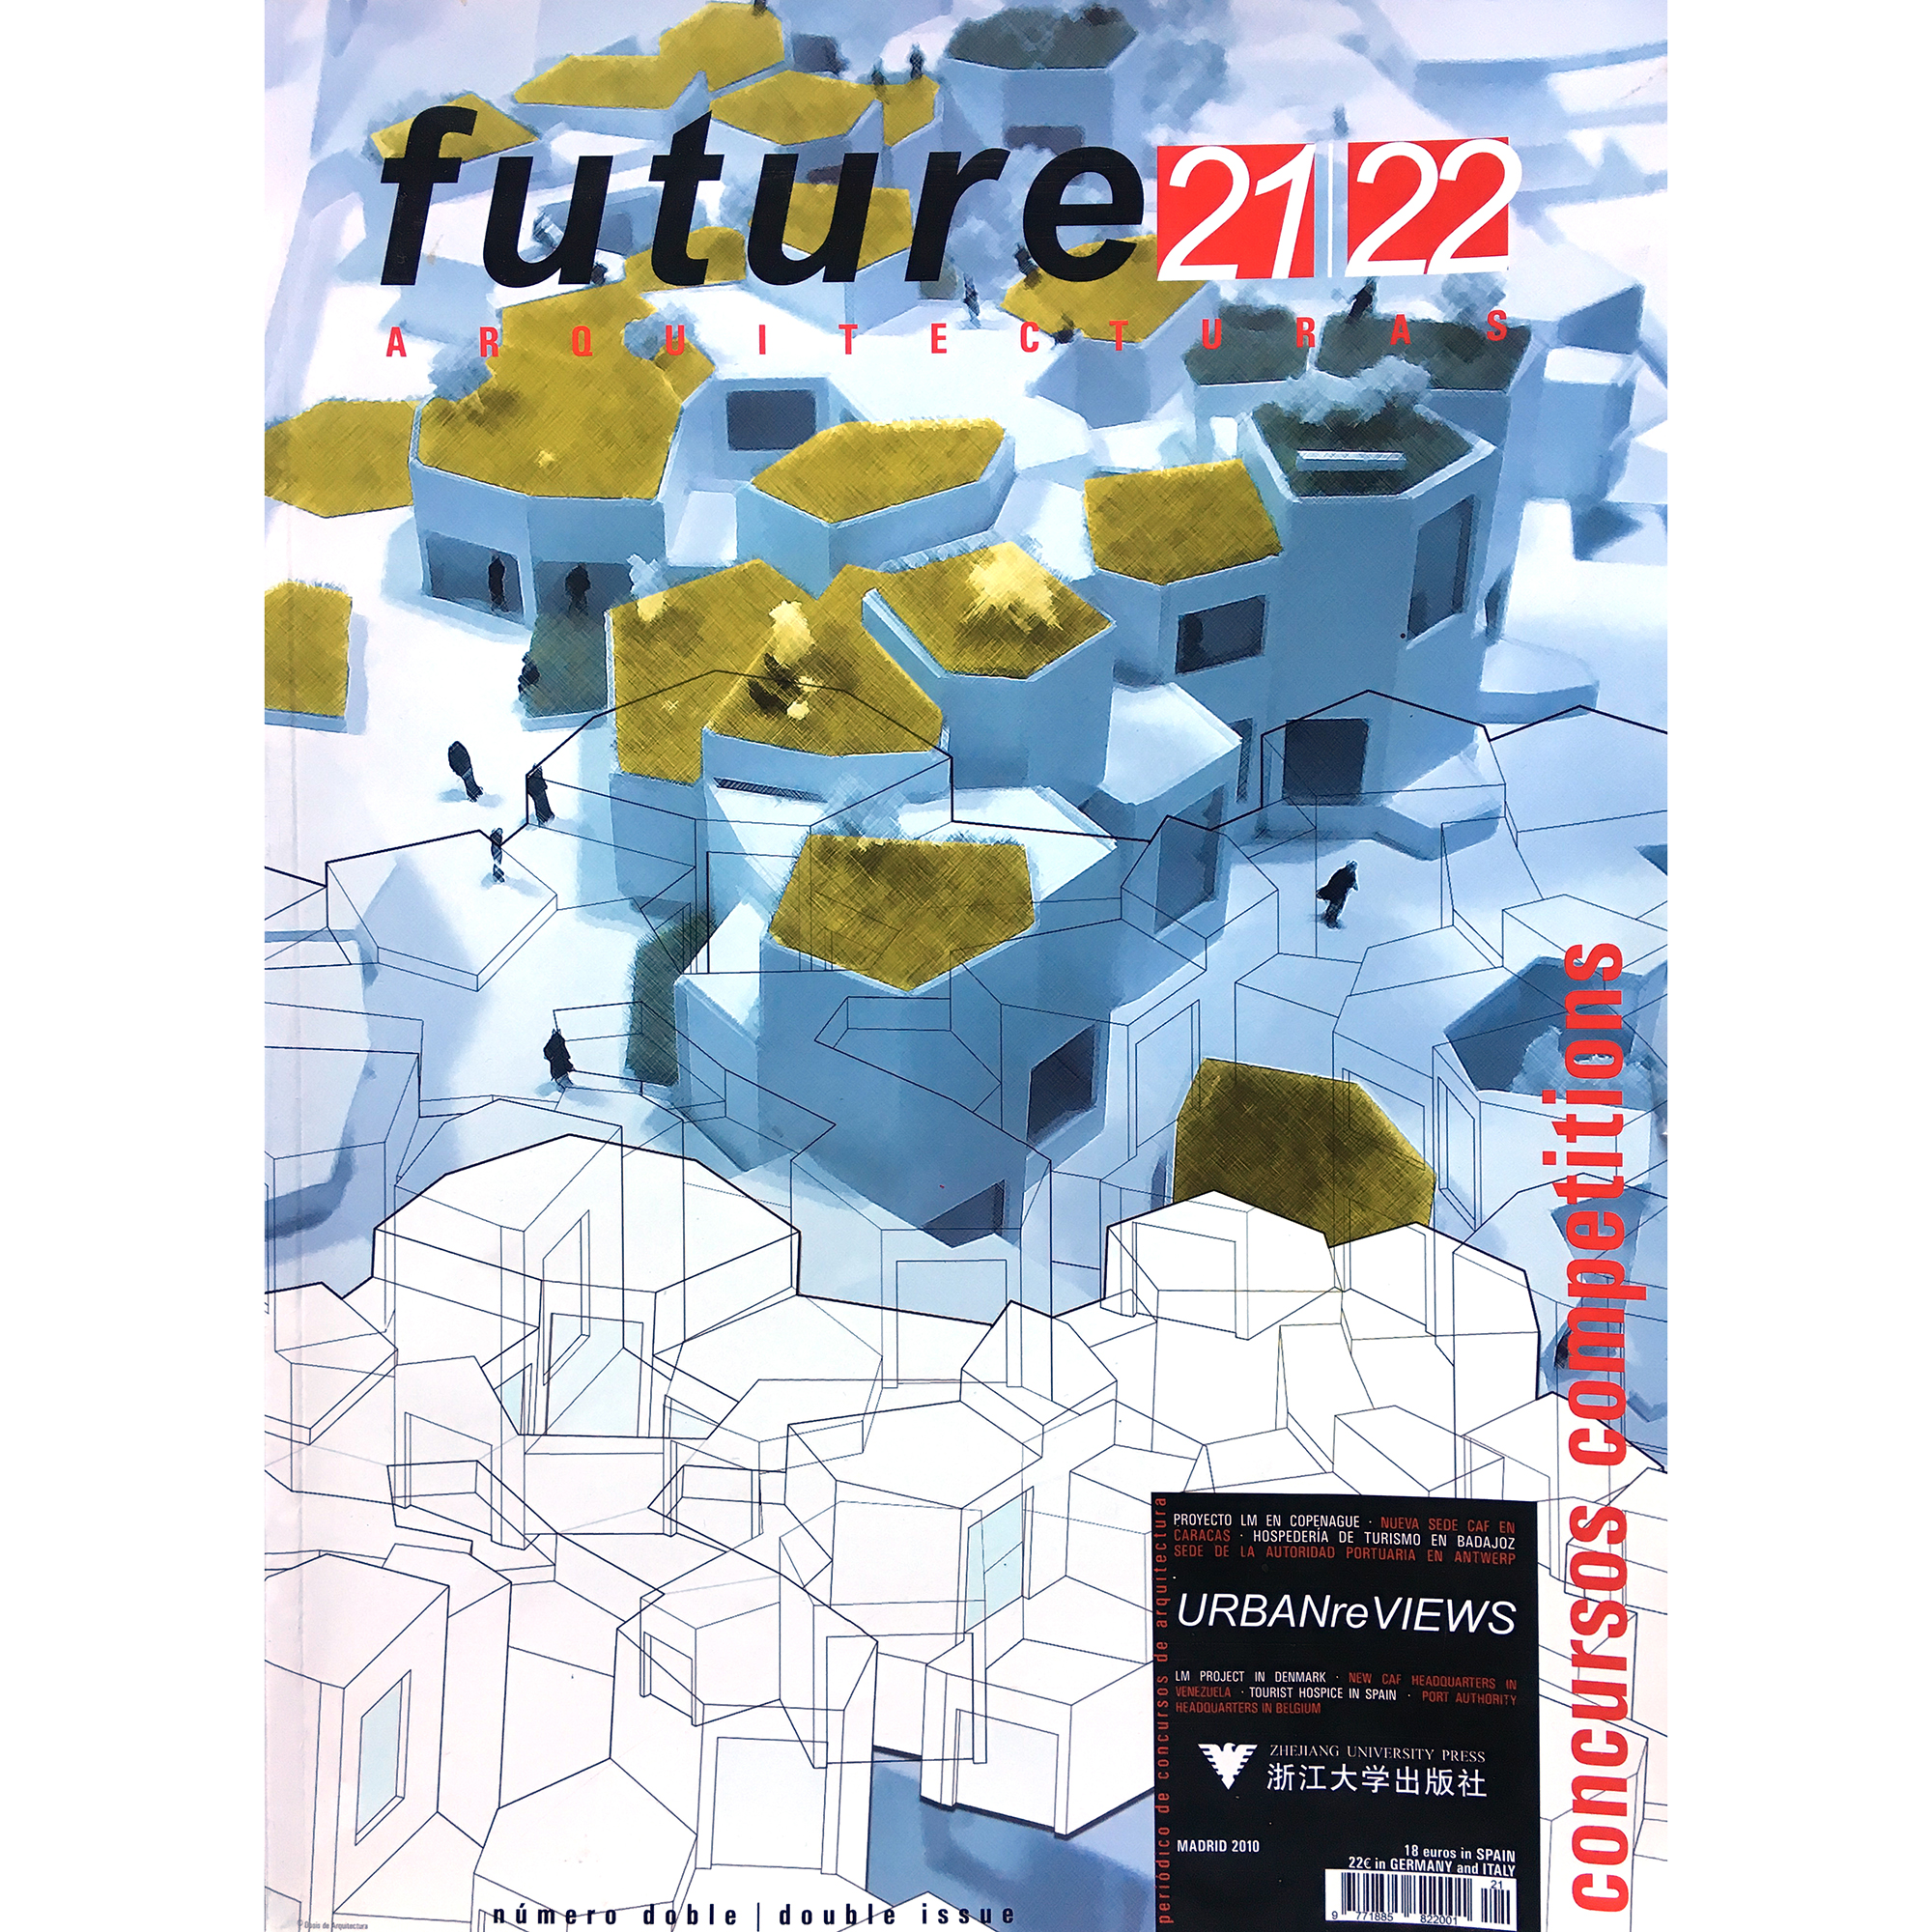 Future 21-22. 2010 (Printed Publication)